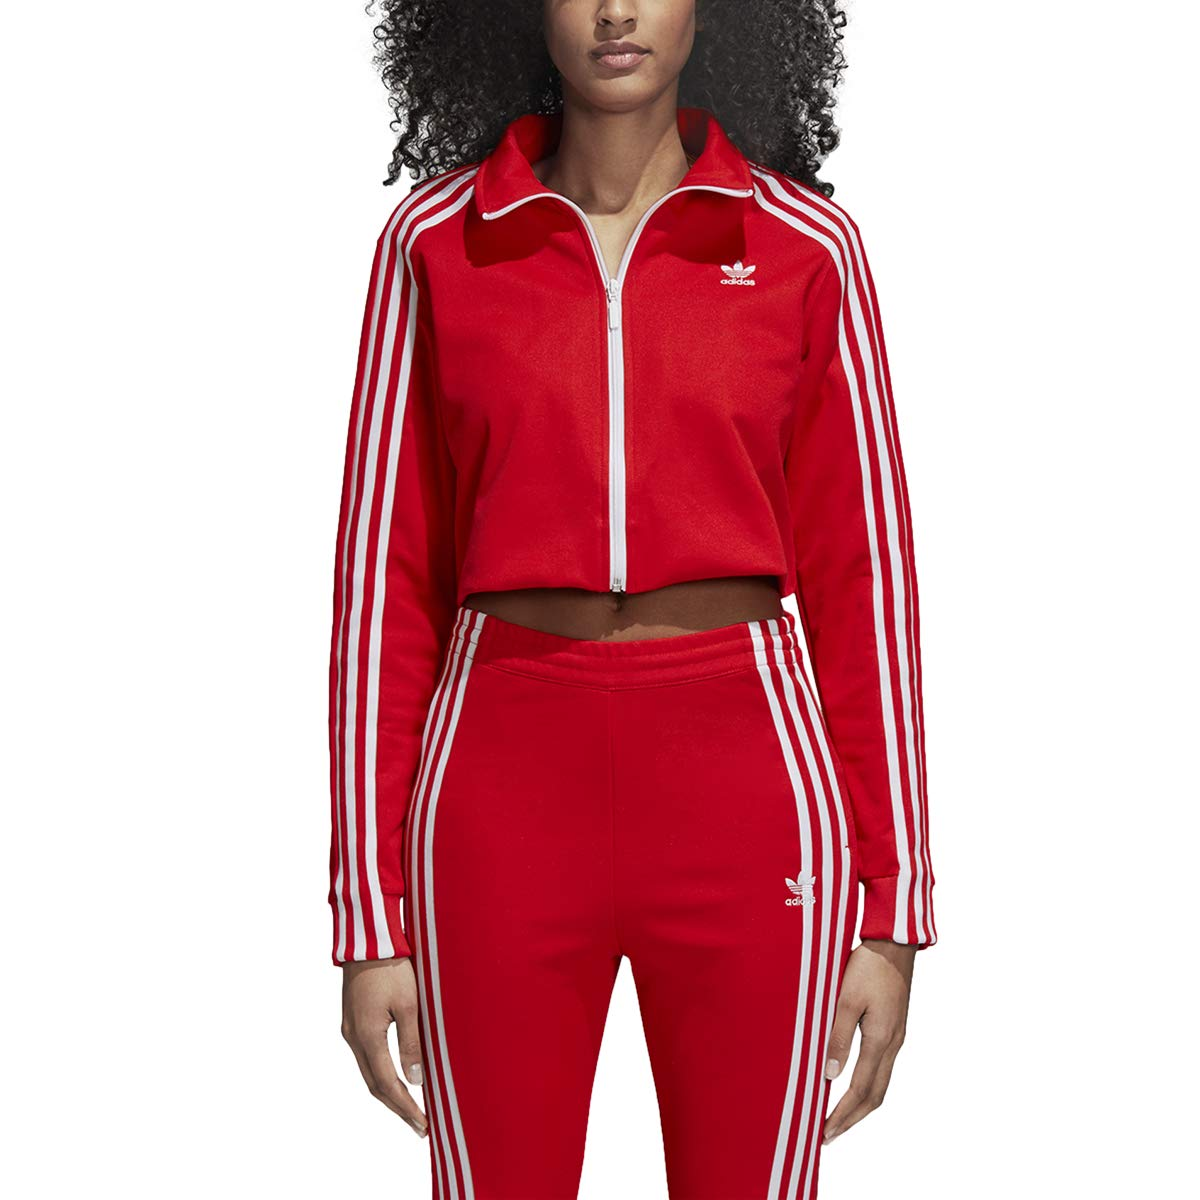 adidas Originals Womens's Superstar Tracktop (S, Red)